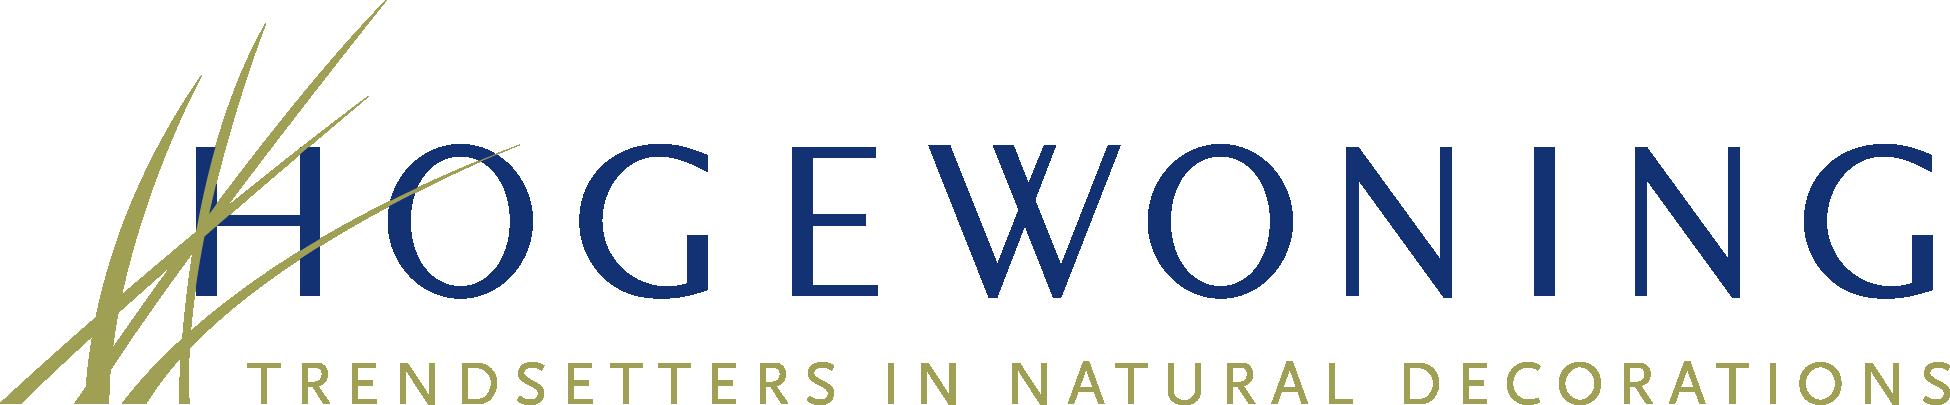 logo-hogewoning-fc-